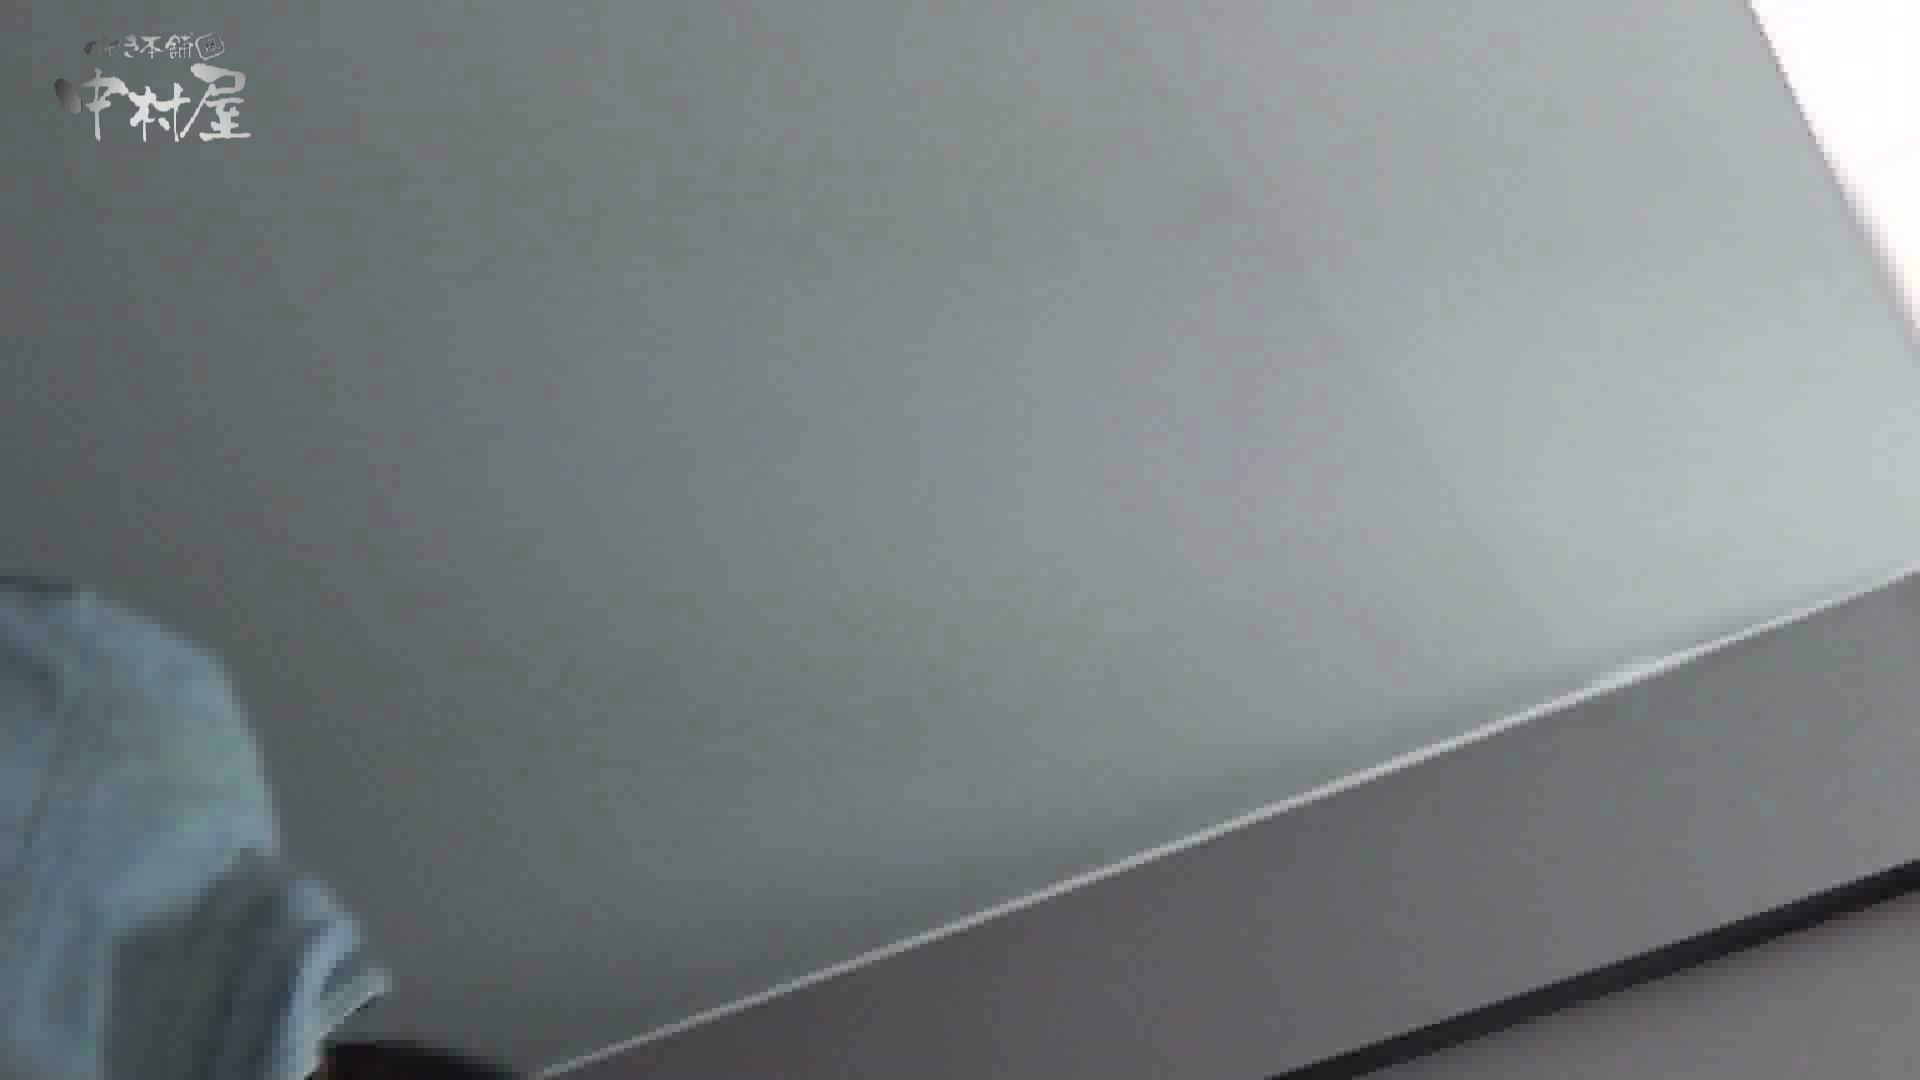 洗面所突入レポート!!vol.22 盗撮映像  66Pix 66